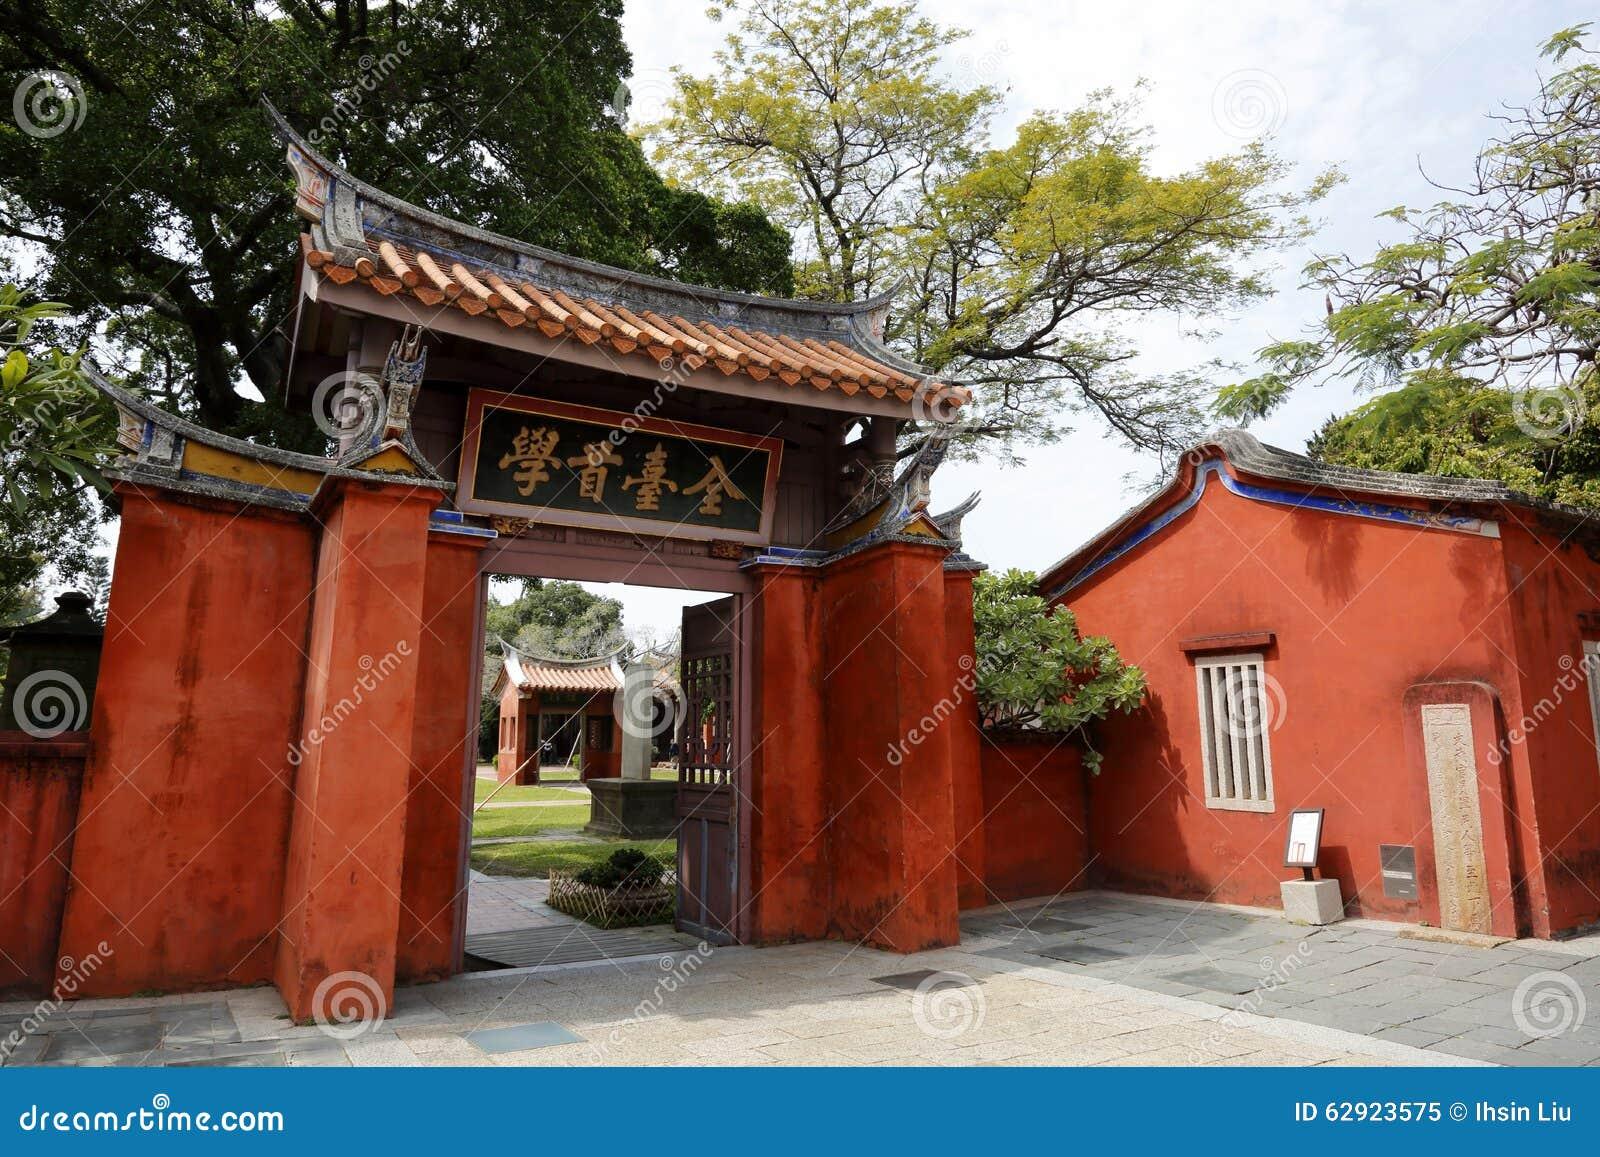 Tainan Konfucjuszowa świątynia, Tainan, Tajwan, 2015